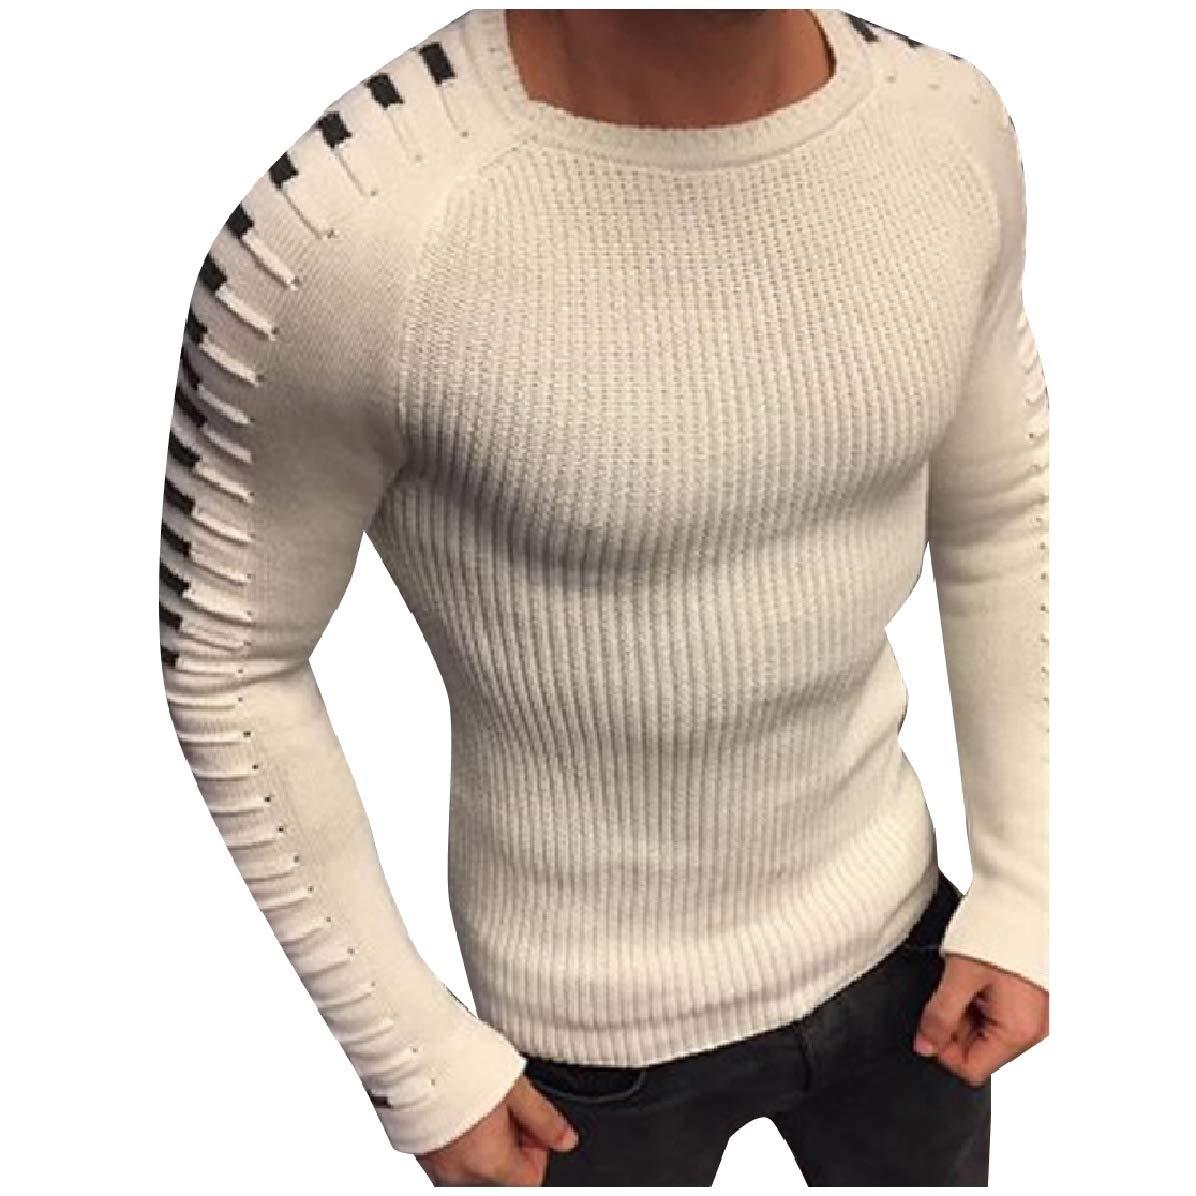 Comaba Mens Jerseys Warm Long-Sleeve Vogue Fall Winter Knitting Sweater